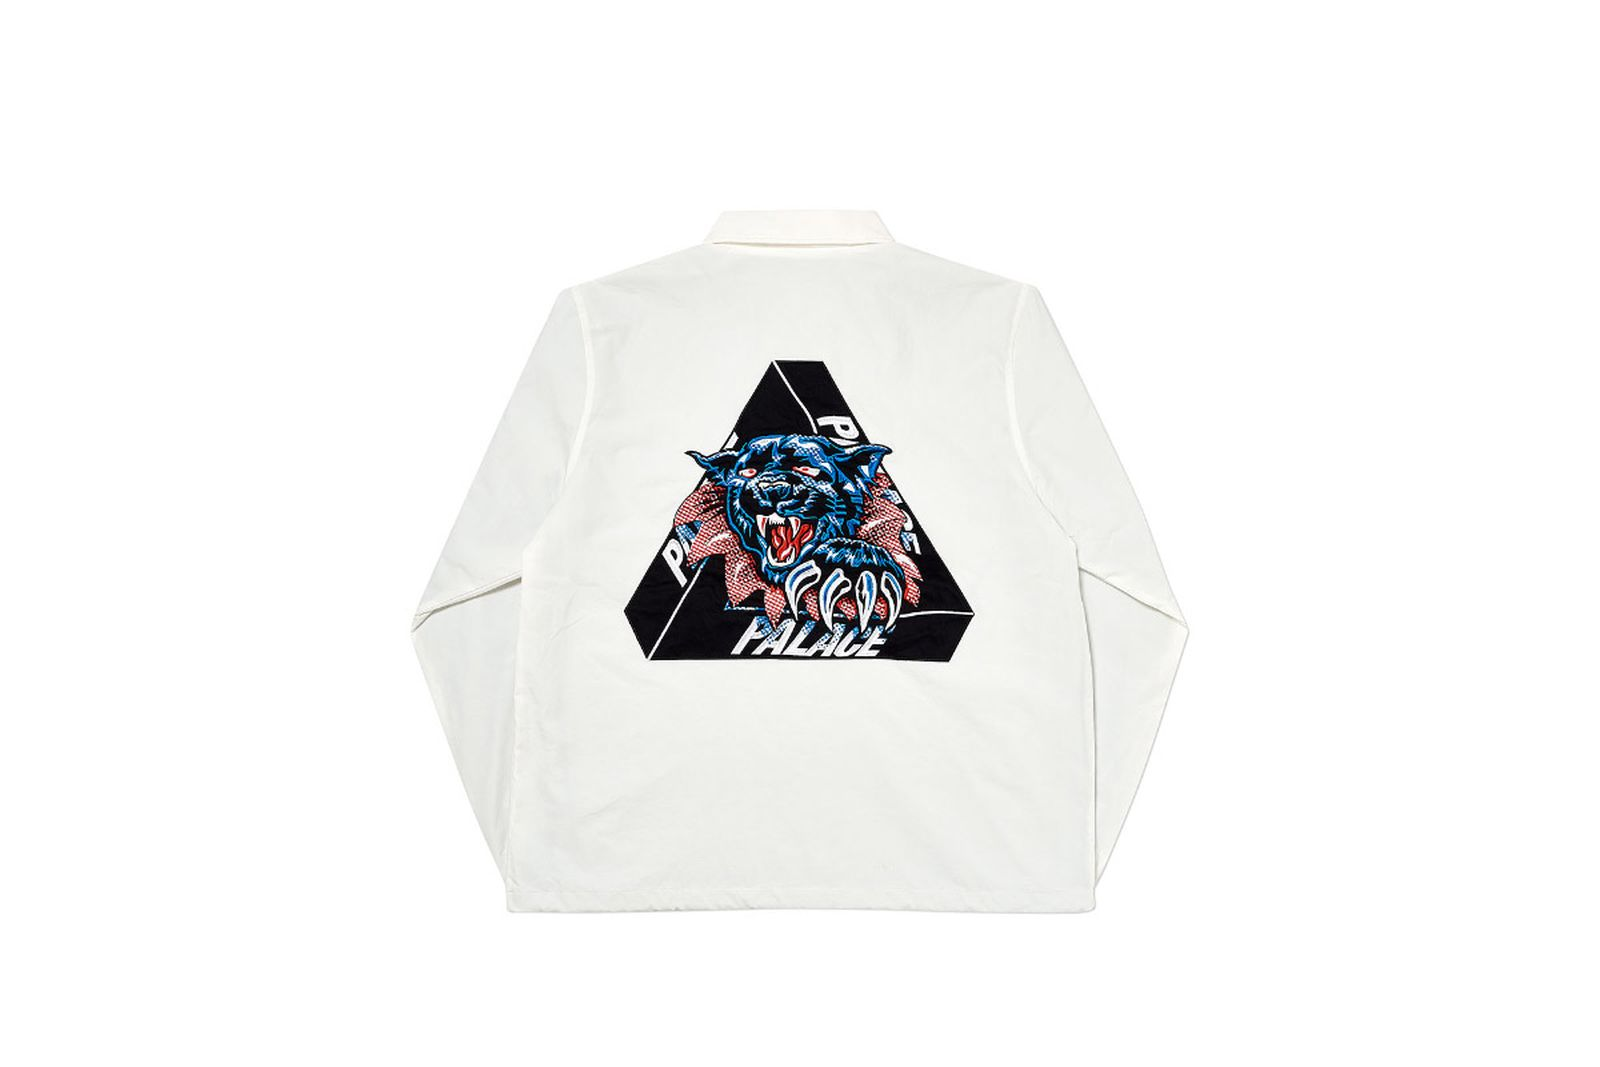 Palace 2019 Autumn Jacket Ripped Coach white back fw19